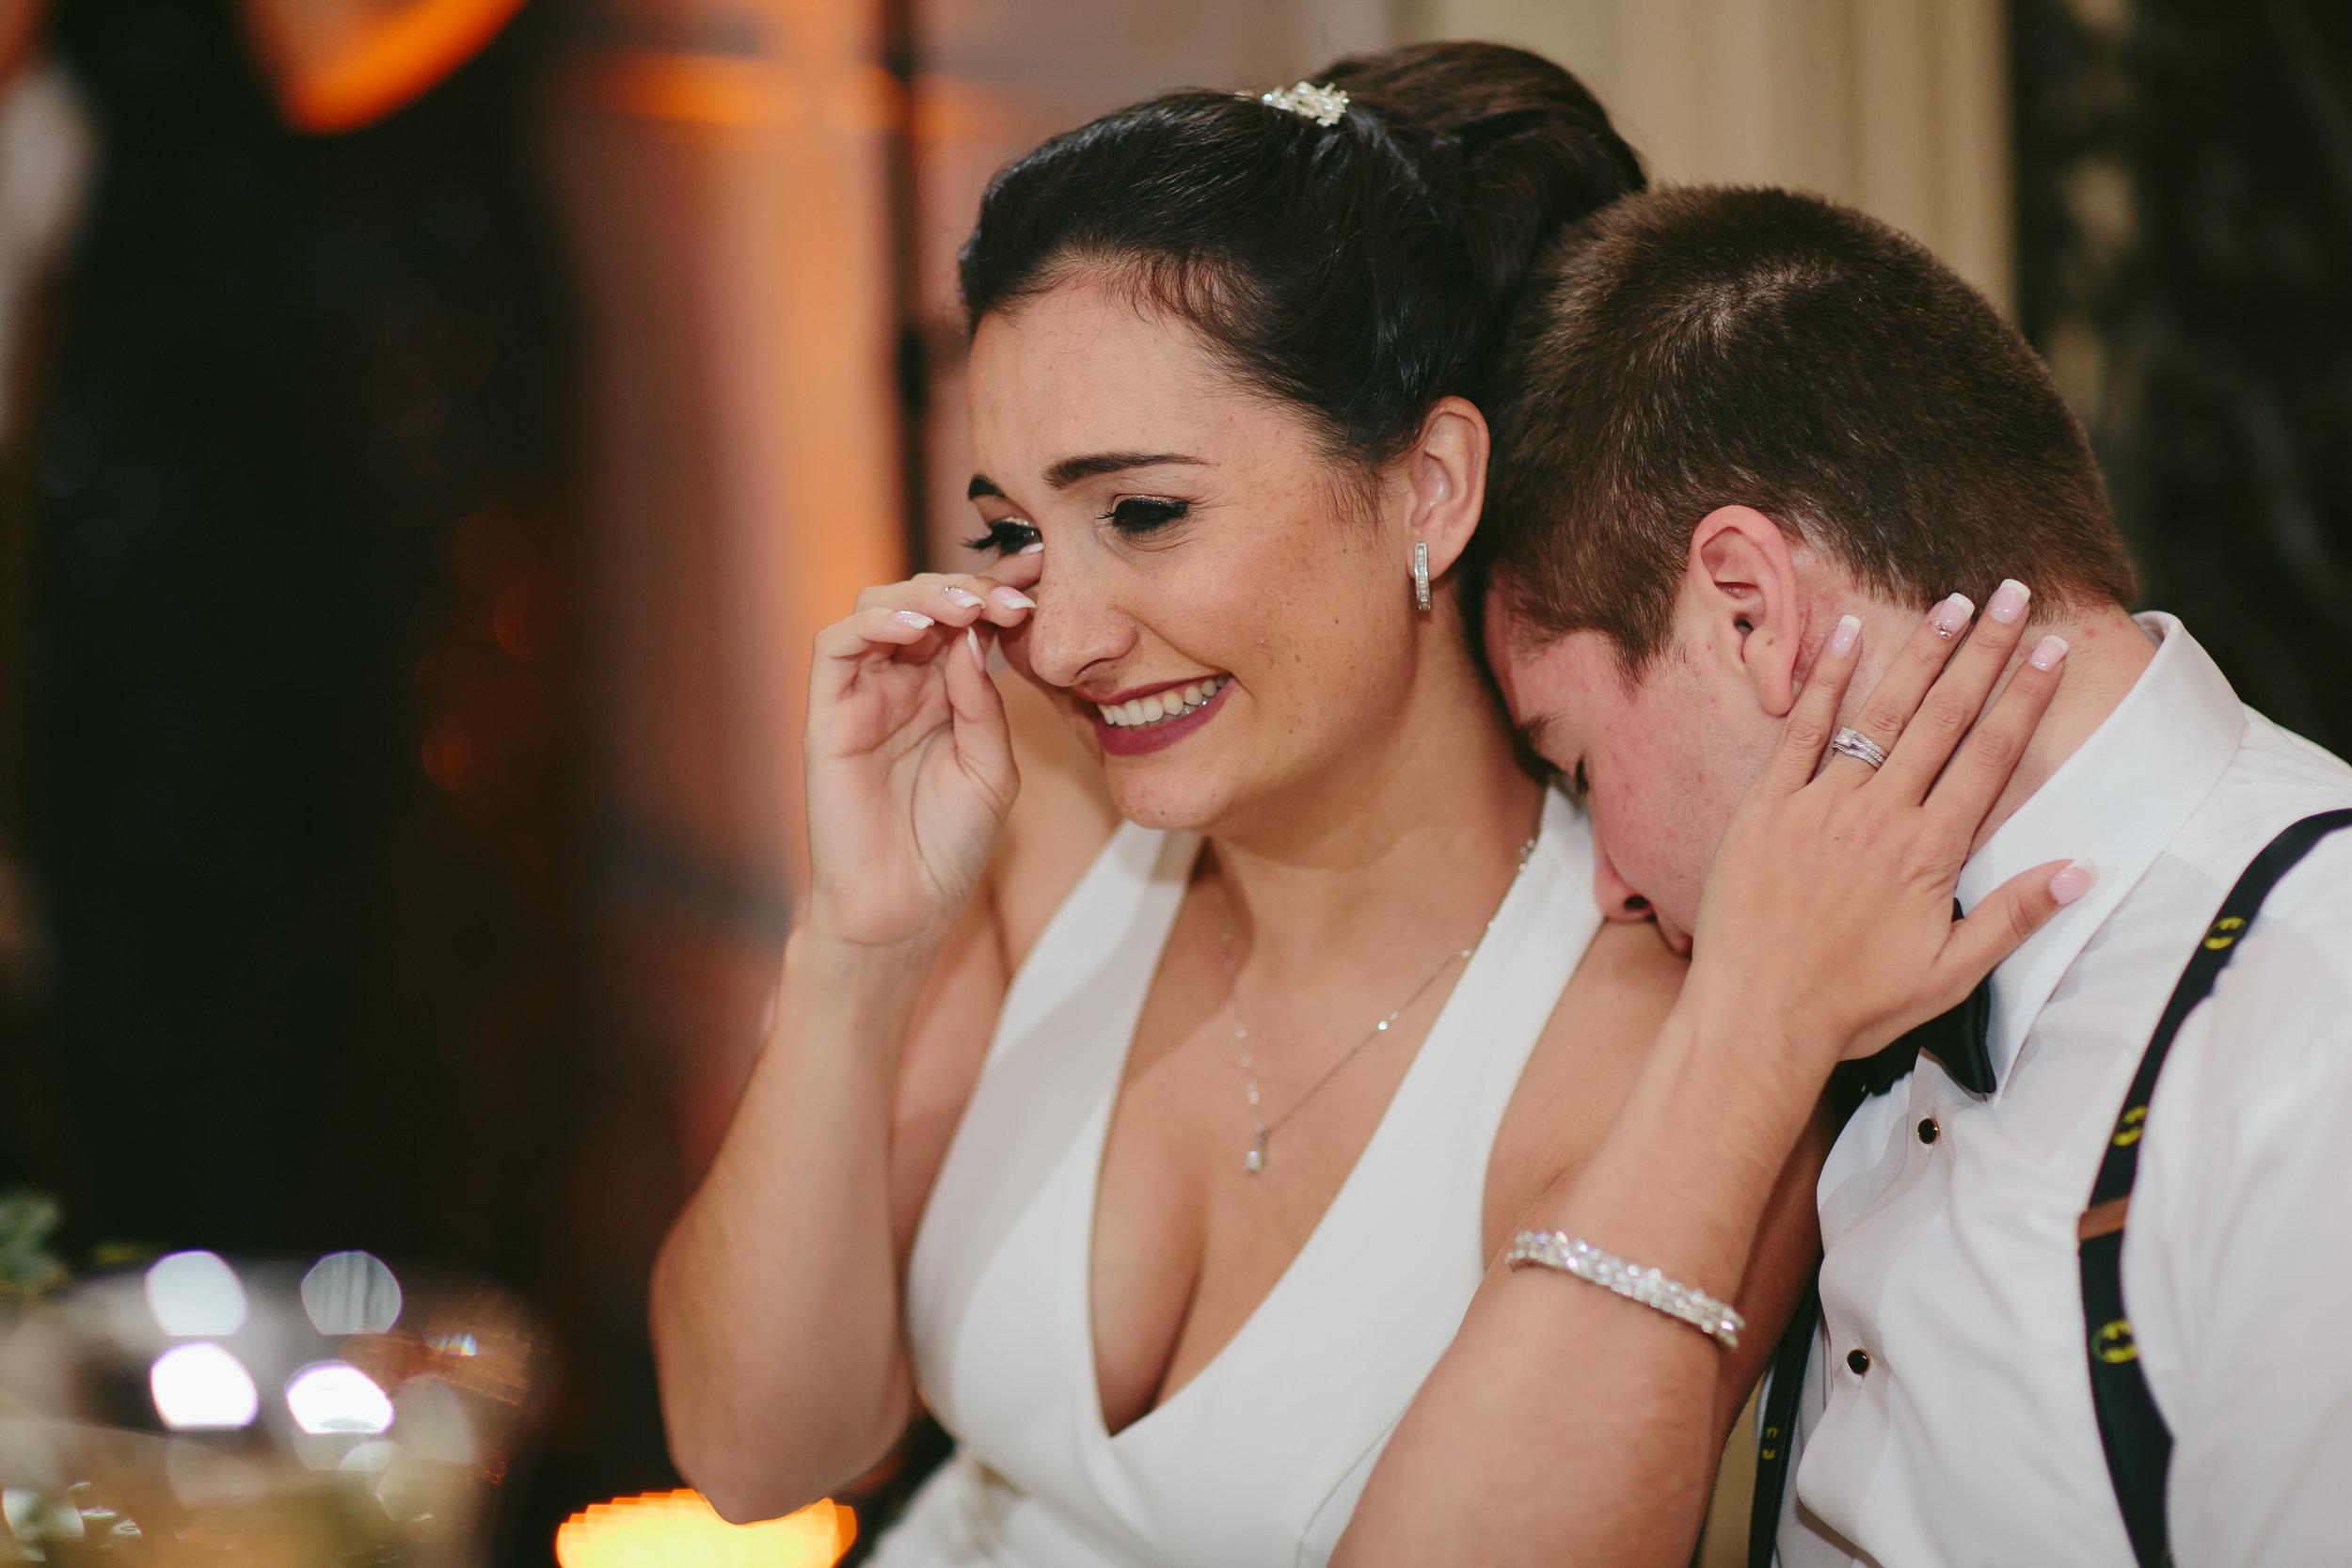 fun_wedding_couple_moments_happy_tears_tiny_house_photo.jpg